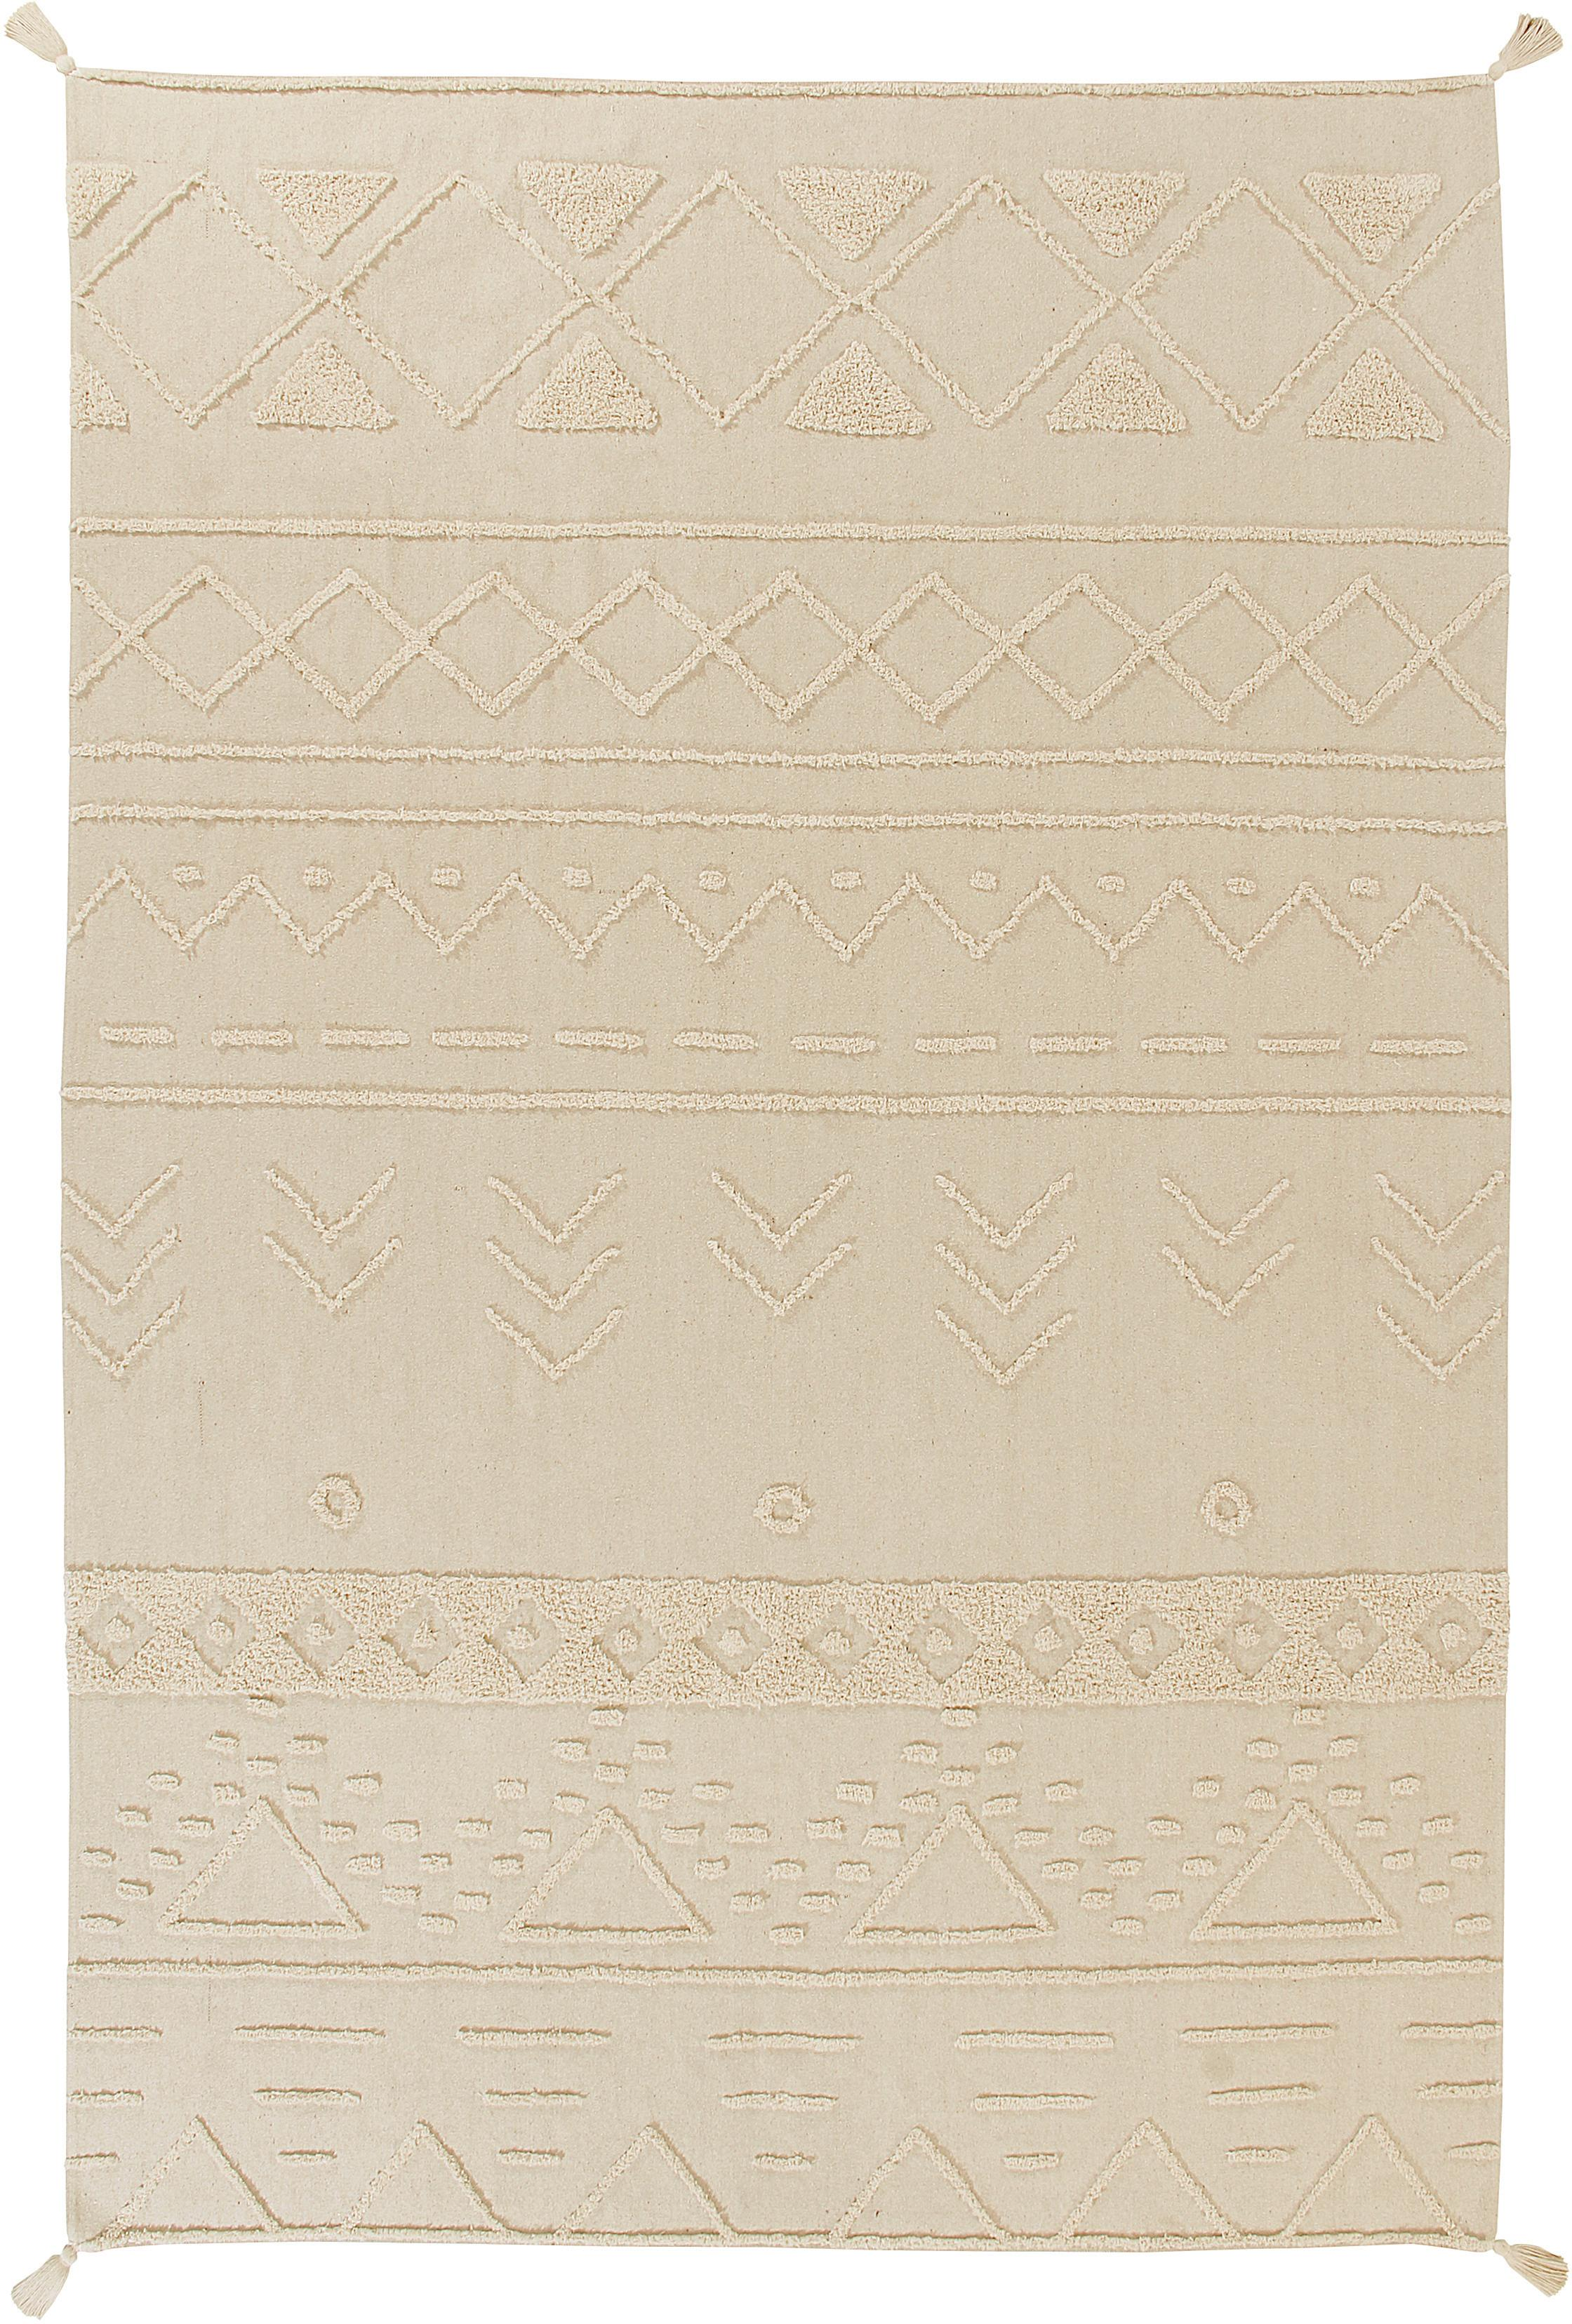 Ethno Teppich Tribu mit getuftetem Muster, Flor: 97% recycelte Baumwolle, , Grau, Beige, B 170 x L 240 cm (Größe M)